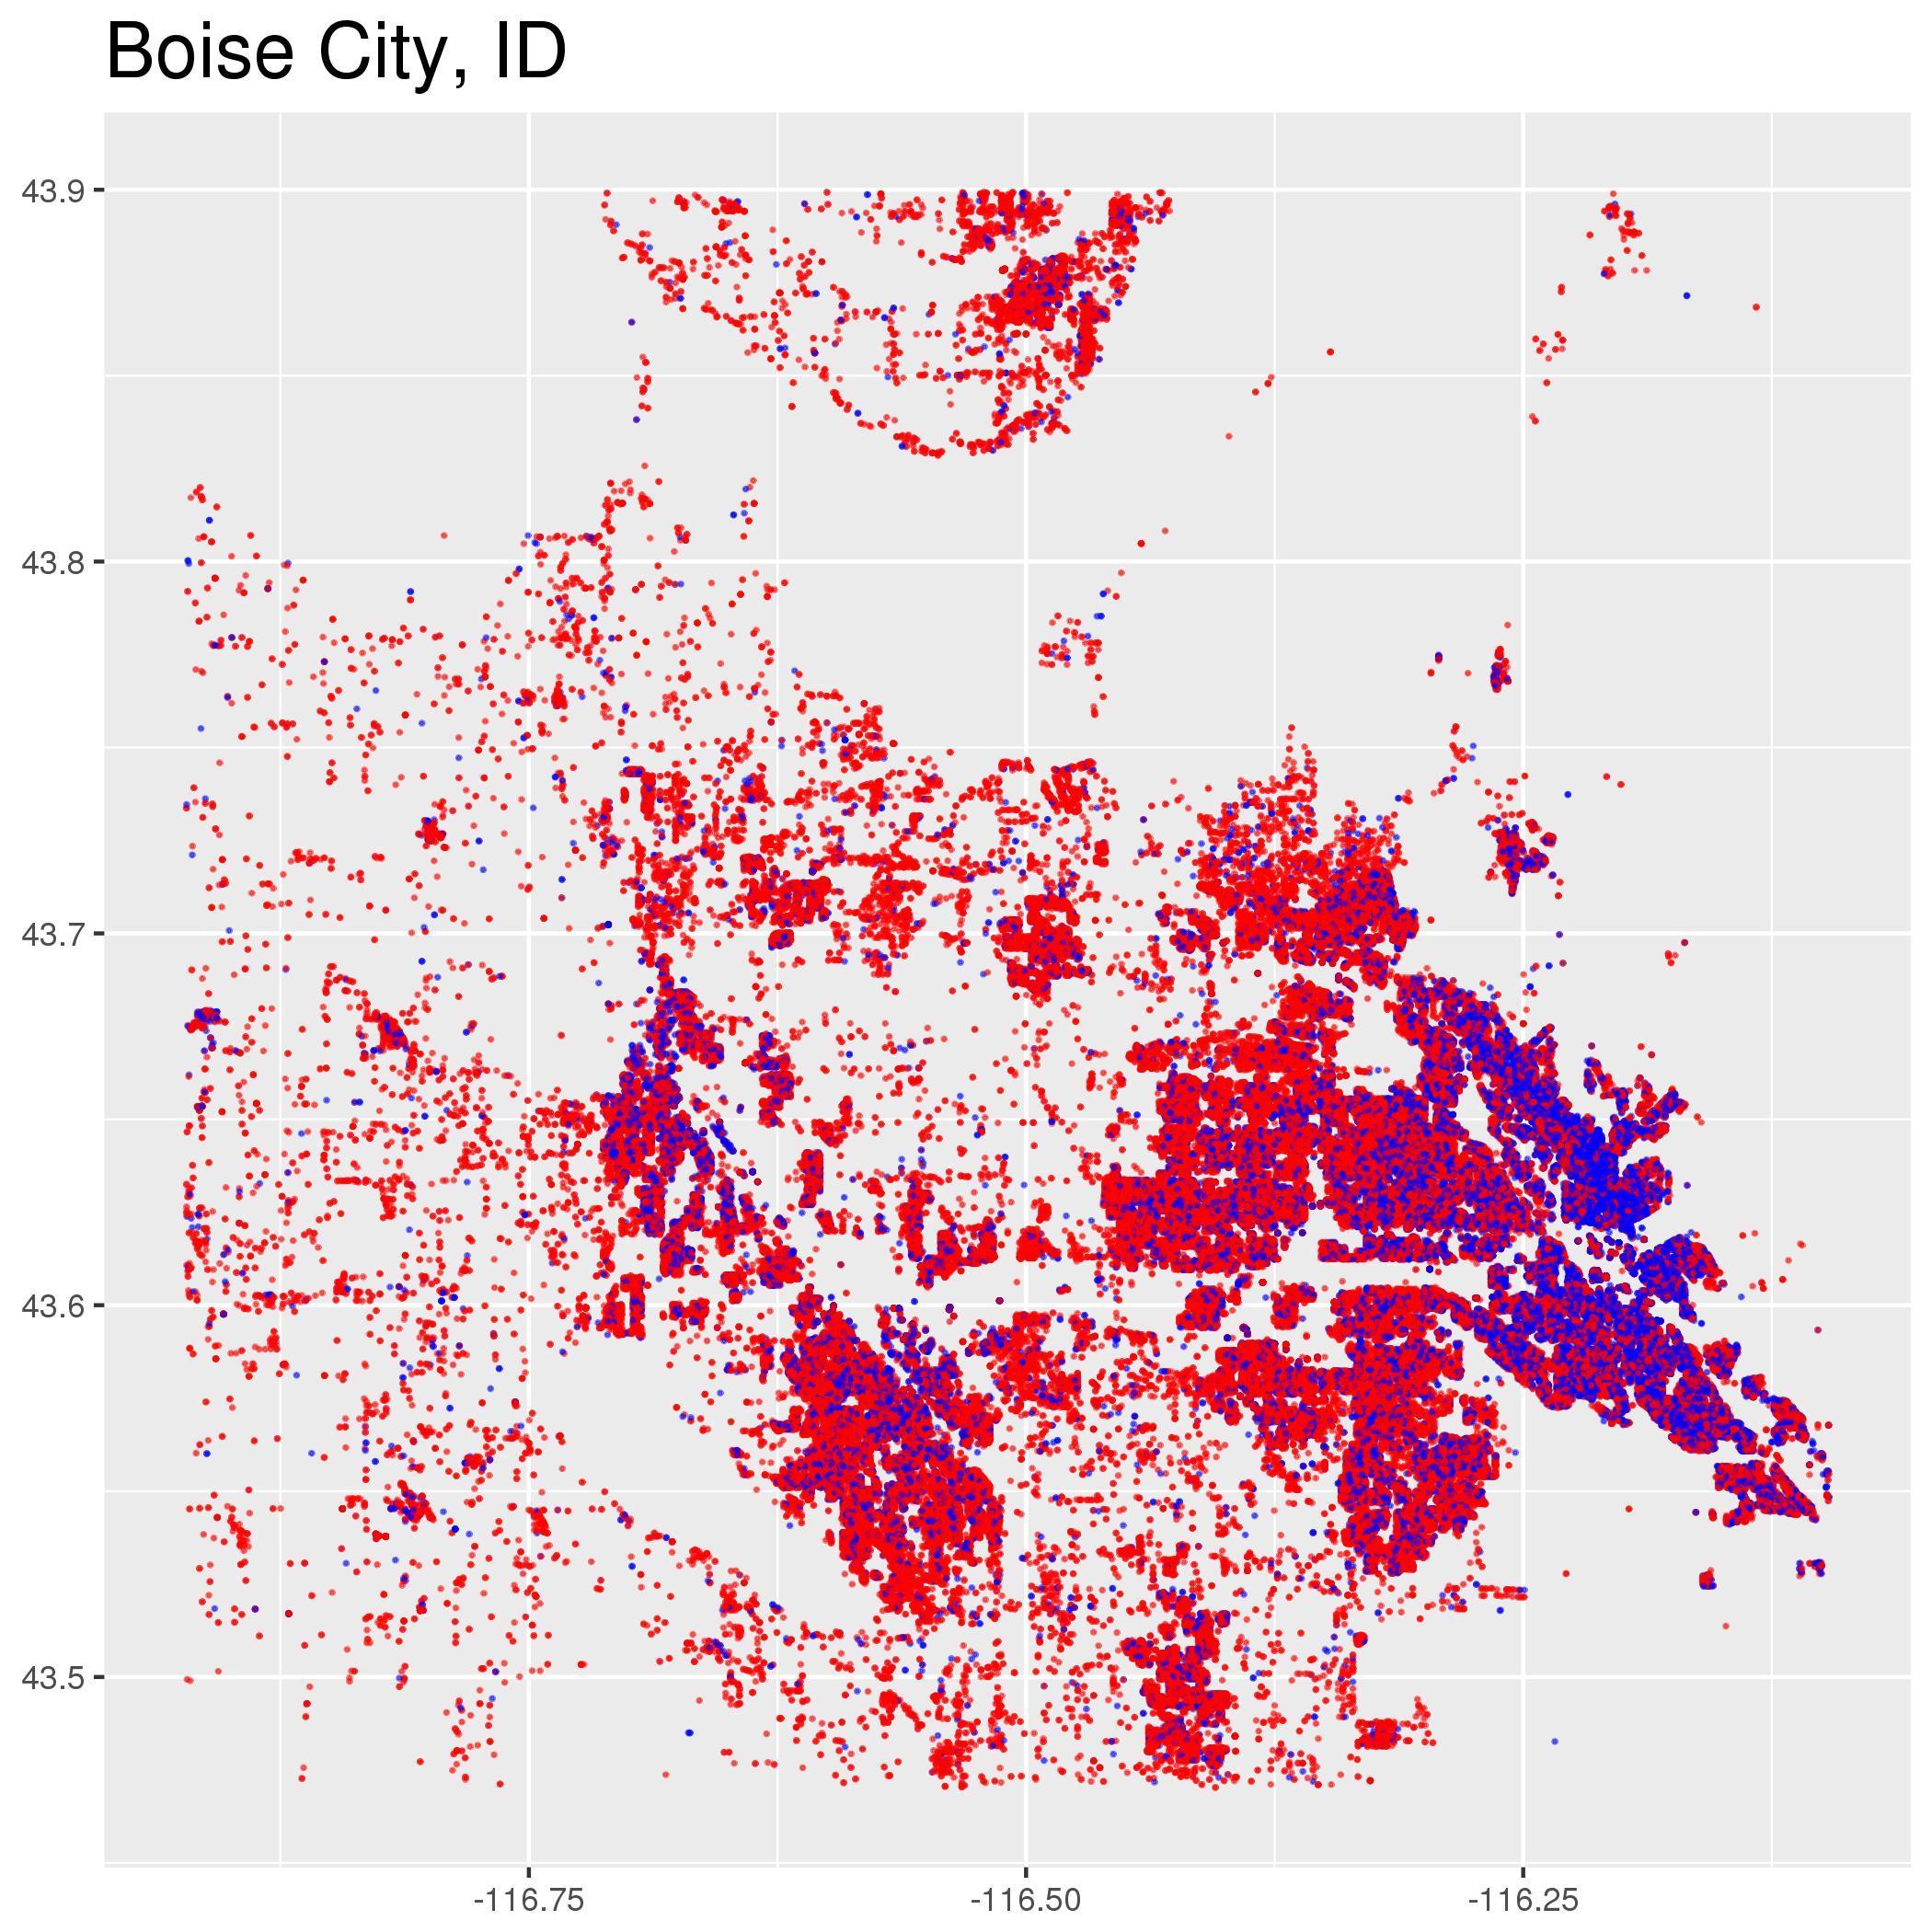 BoiseCityID.jpeg